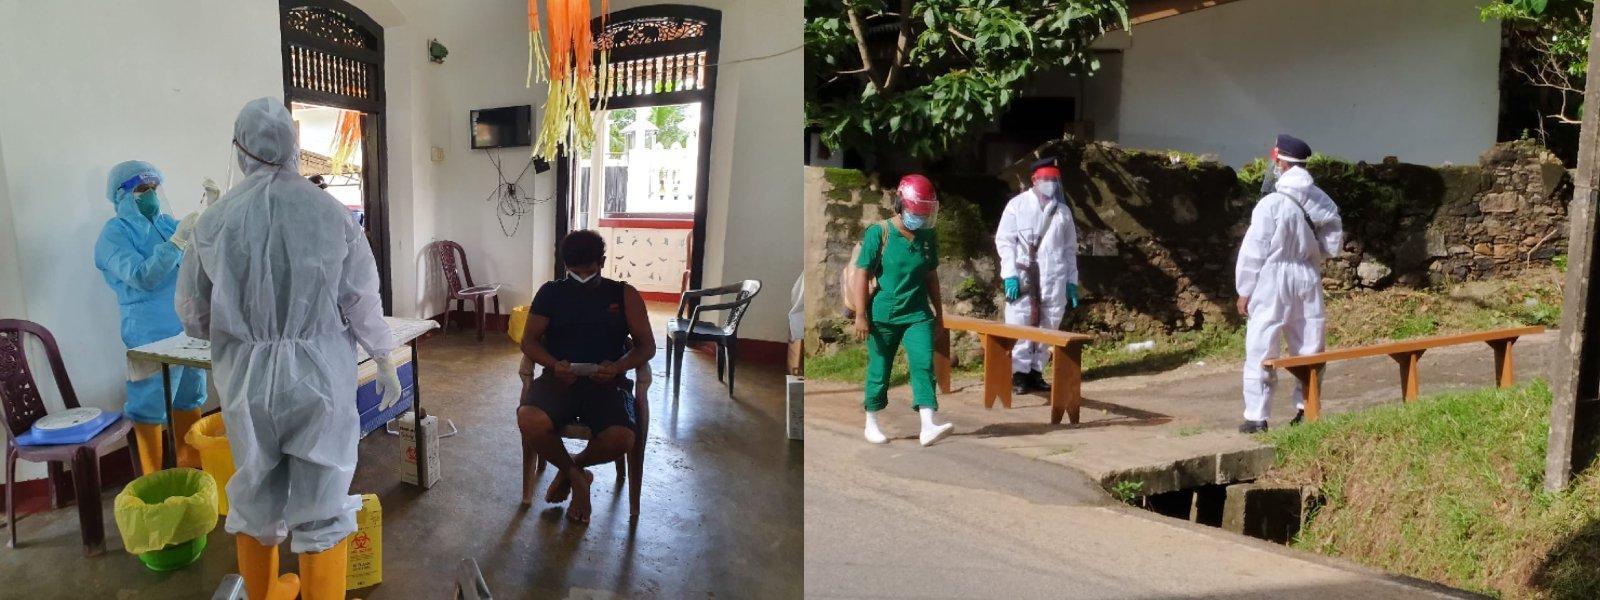 Vaccination drive in Galle, Matara & Kurunegala commences